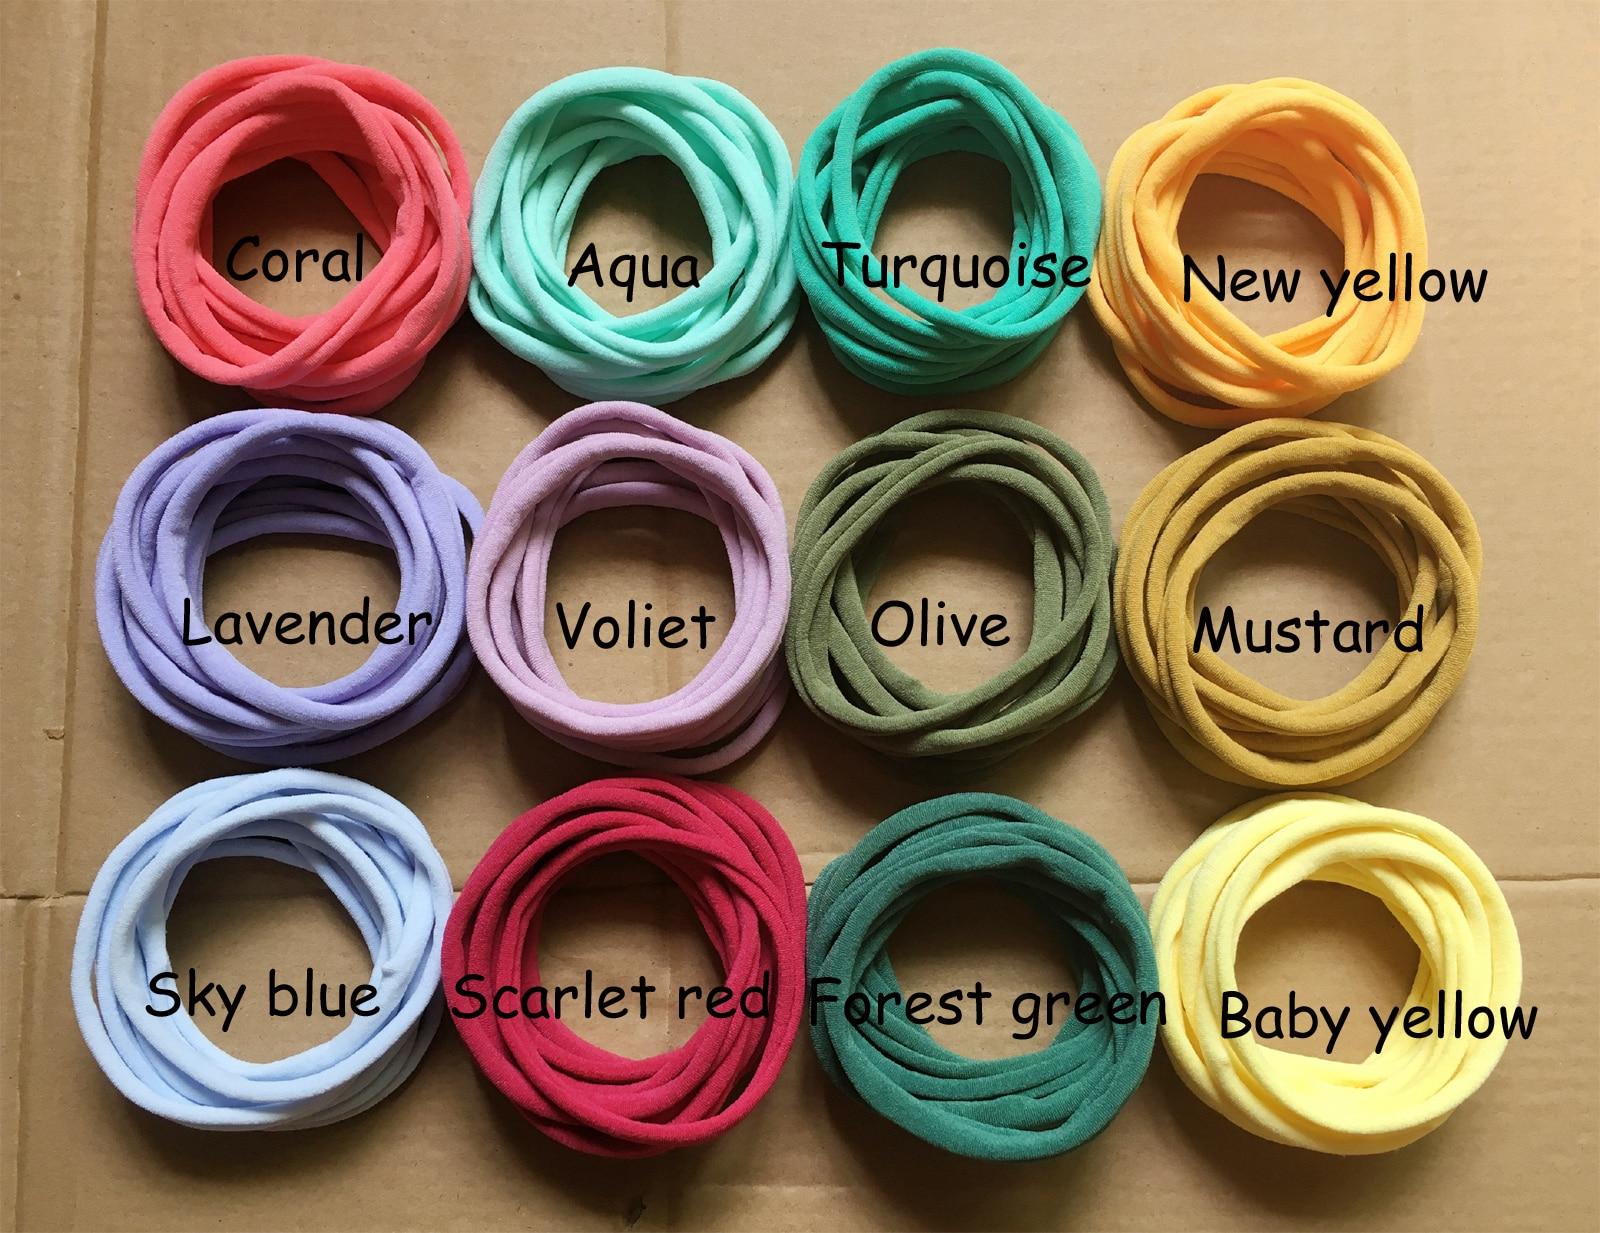 Image 2 - 100 pcs/lot, Super Soft THIN Nylon Headbands, 6mm width wholesale elastic nylon headband-in Hair Accessories from Mother & Kids